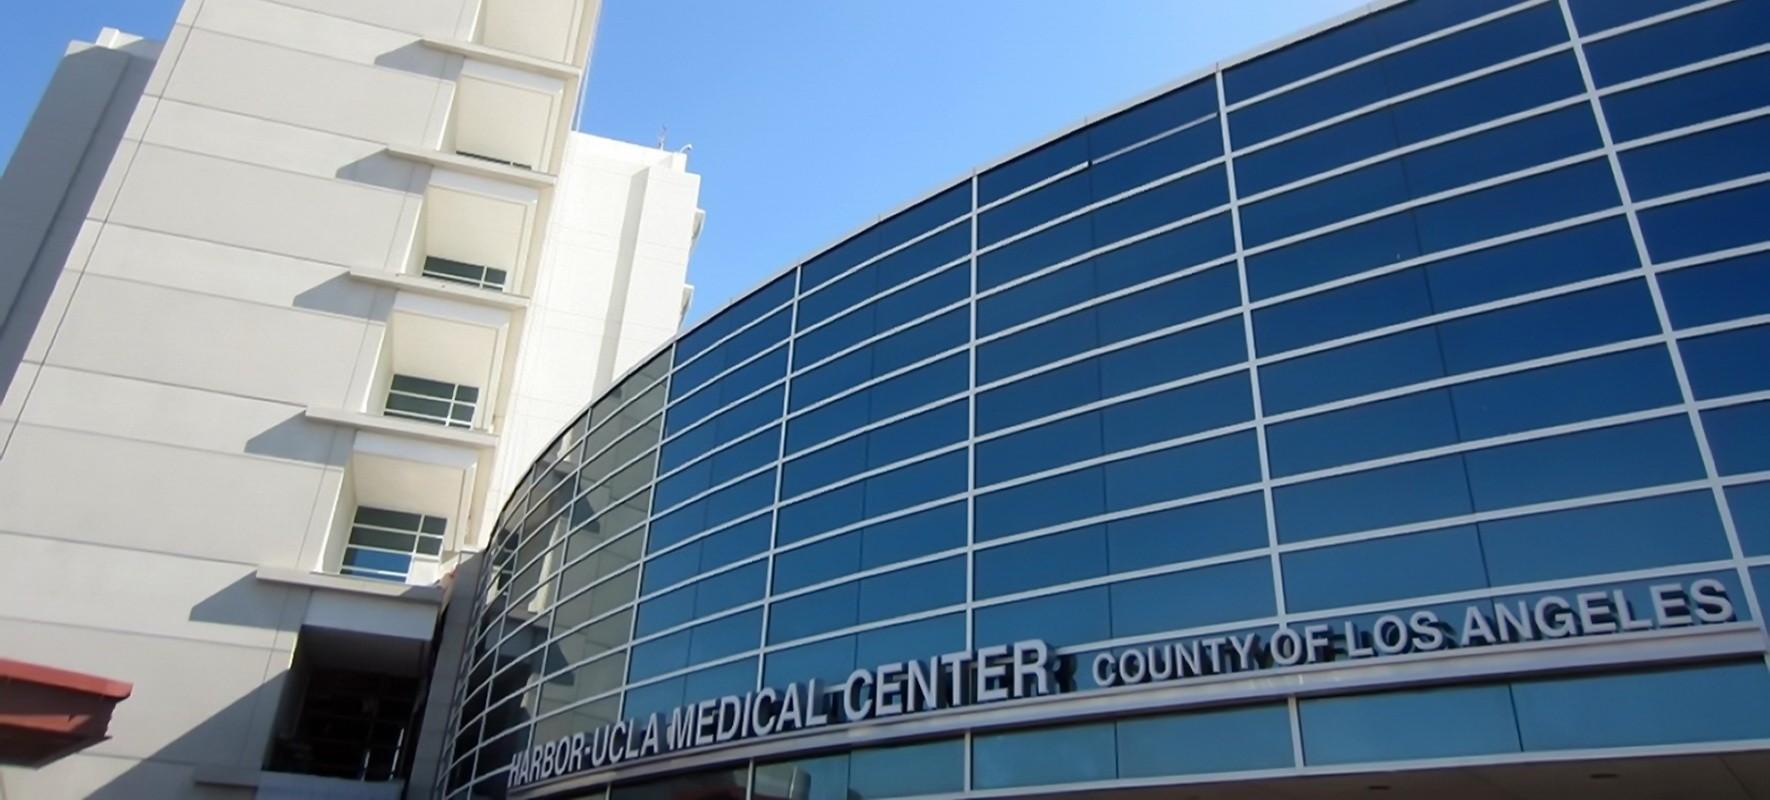 Harbor UCLA Medical Center | Torrance, CA | WJE